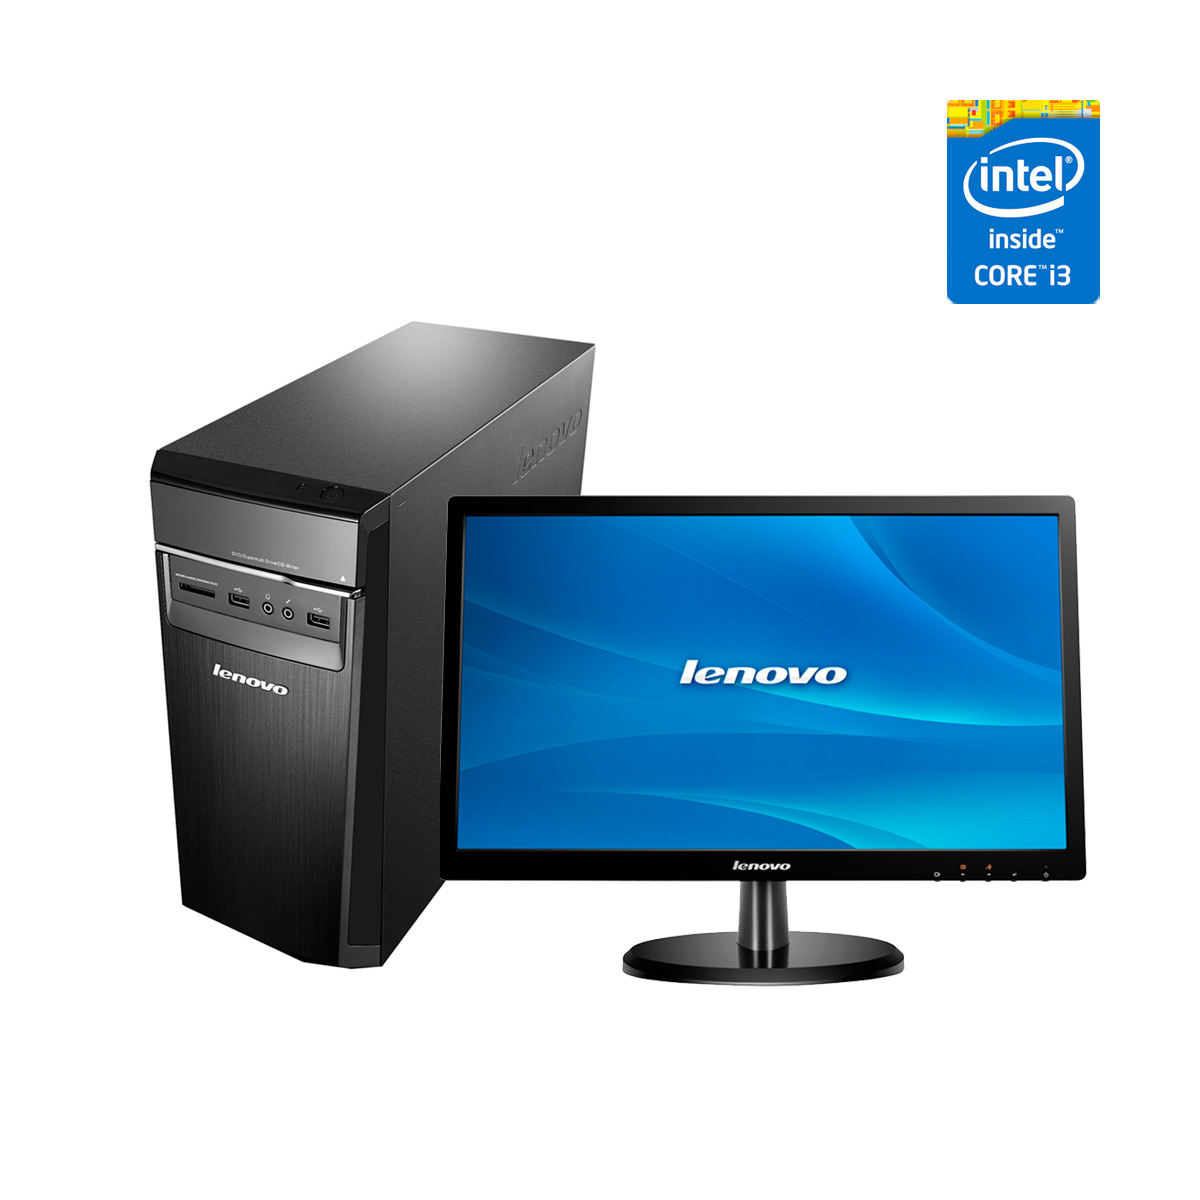 Ordenador sobremesa Lenovo H50-50 Intel Core i3-4160 con monitor